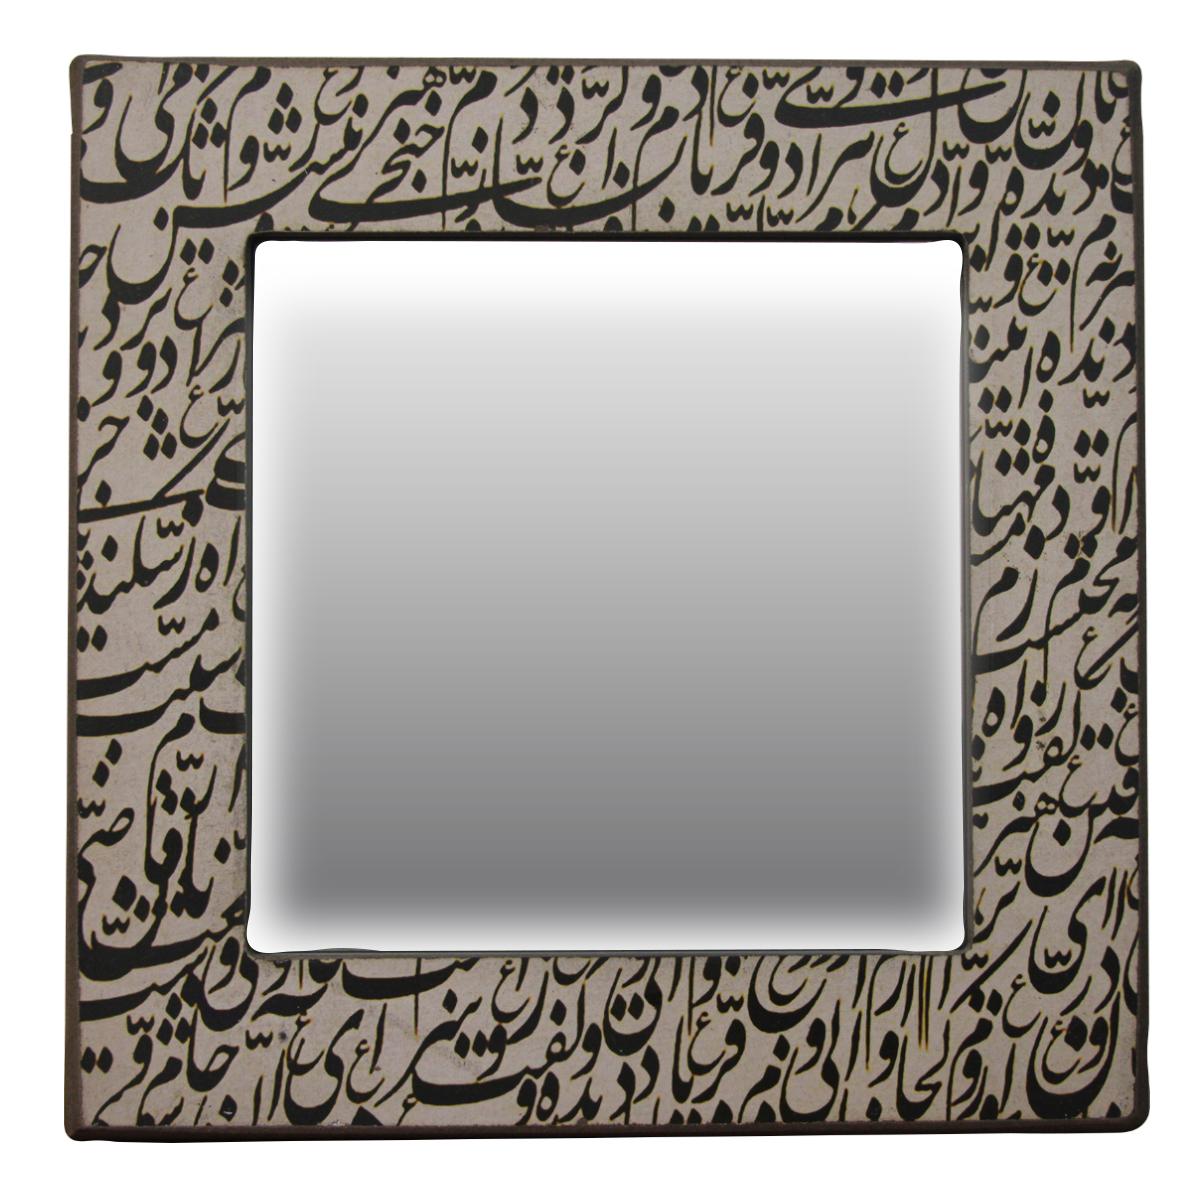 آینه چوبی کد 398.2